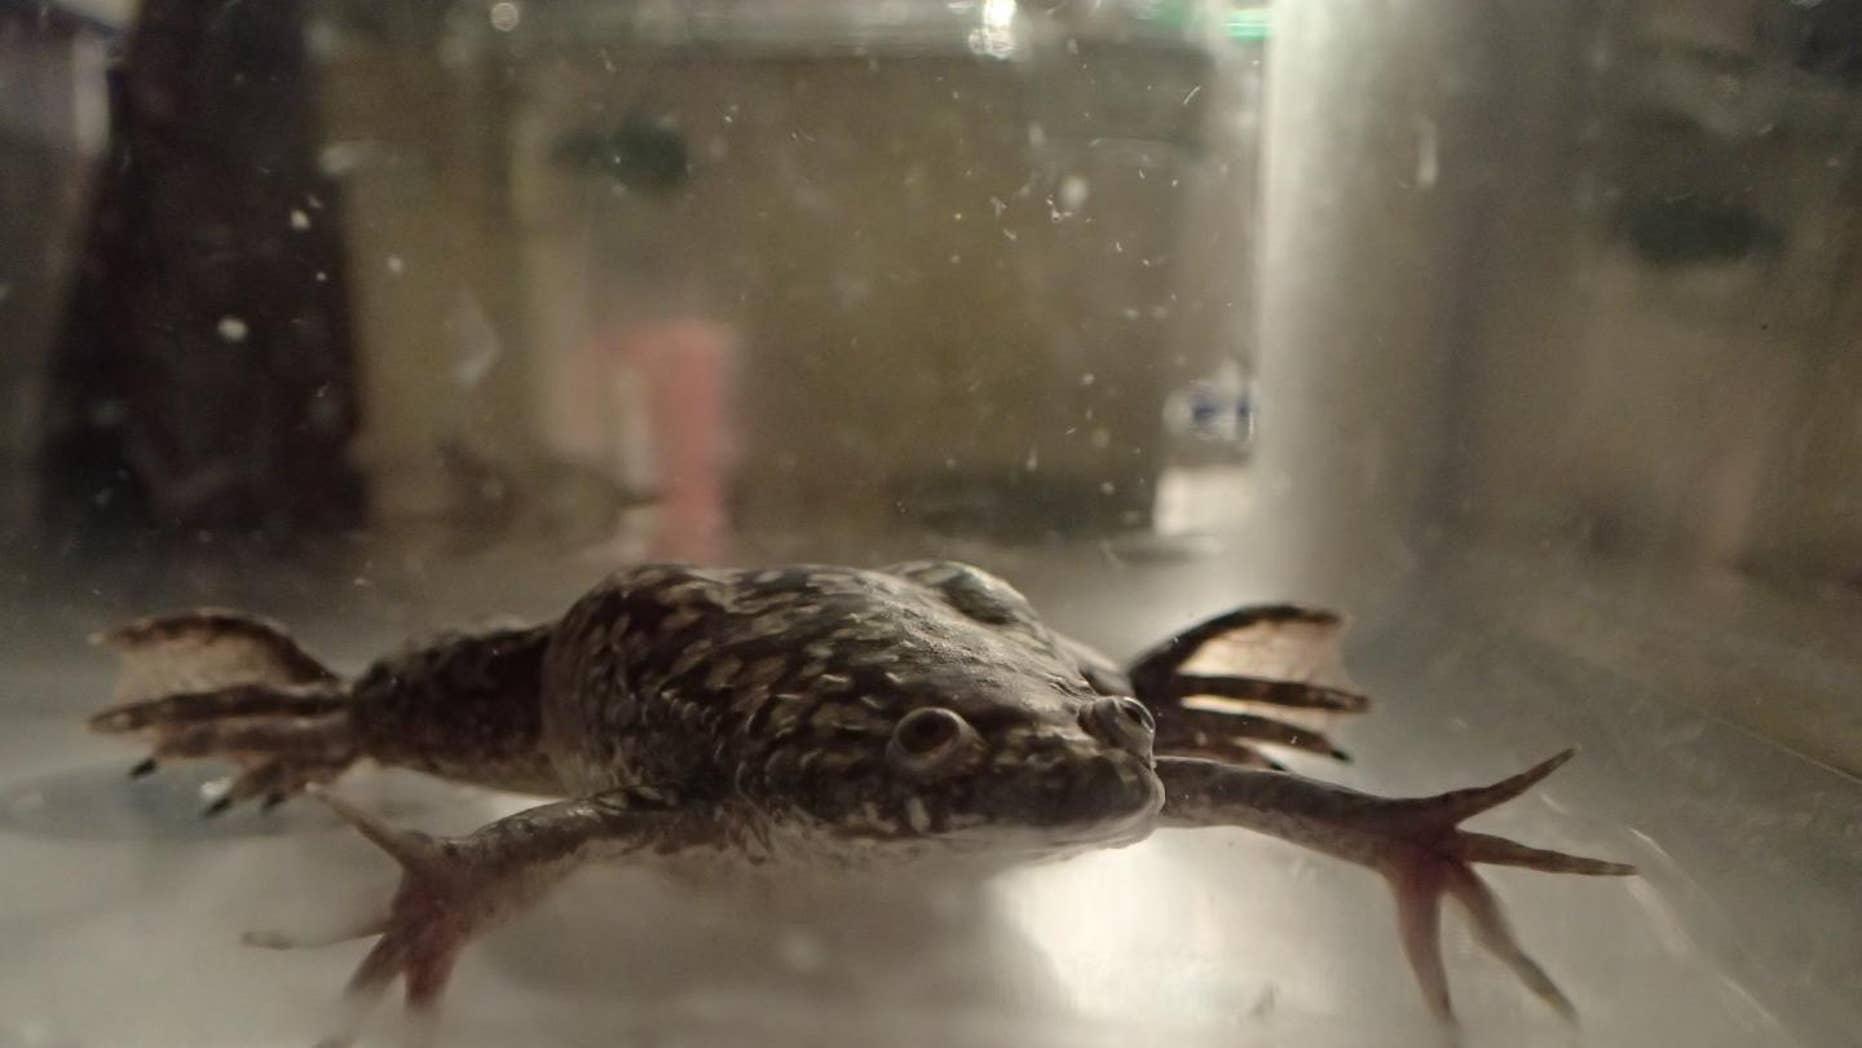 This image shows Xenopus laevis swimming in a tank pre-amputation. (Celia Herrera-Rincon/Tufts University)